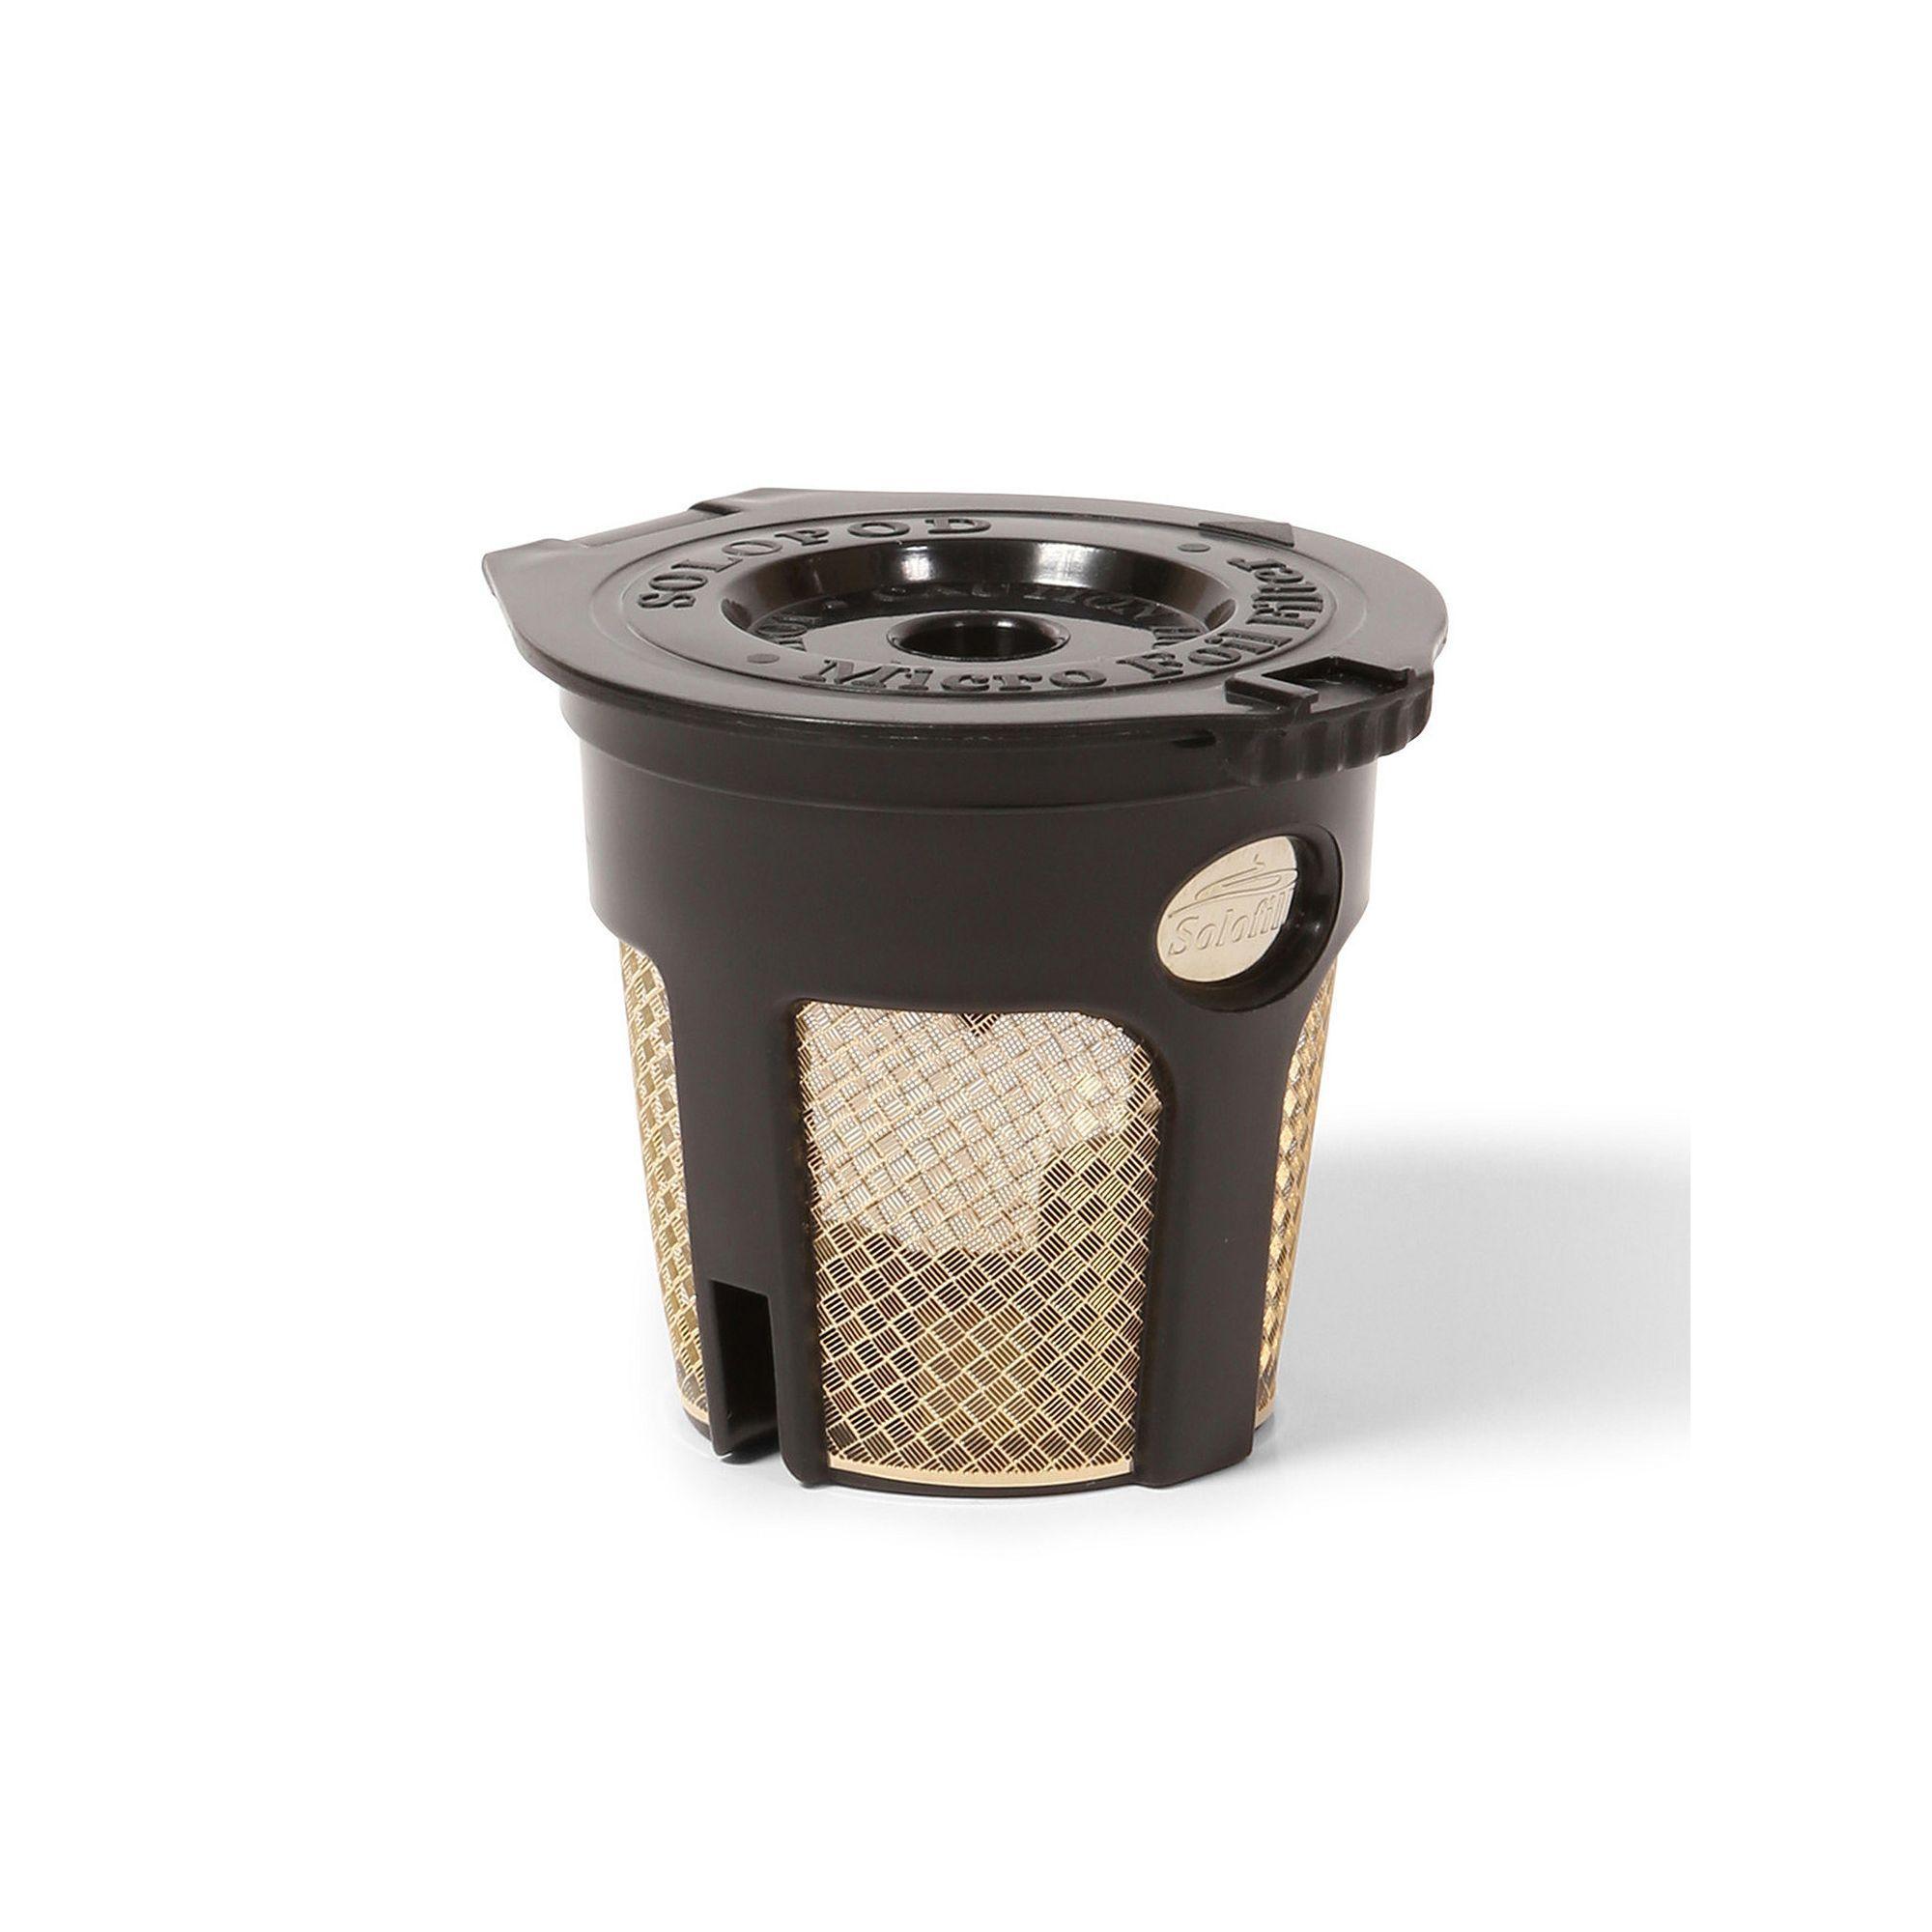 Solofill SoloPad Reusable SingleServe Coffee Pod Coffee